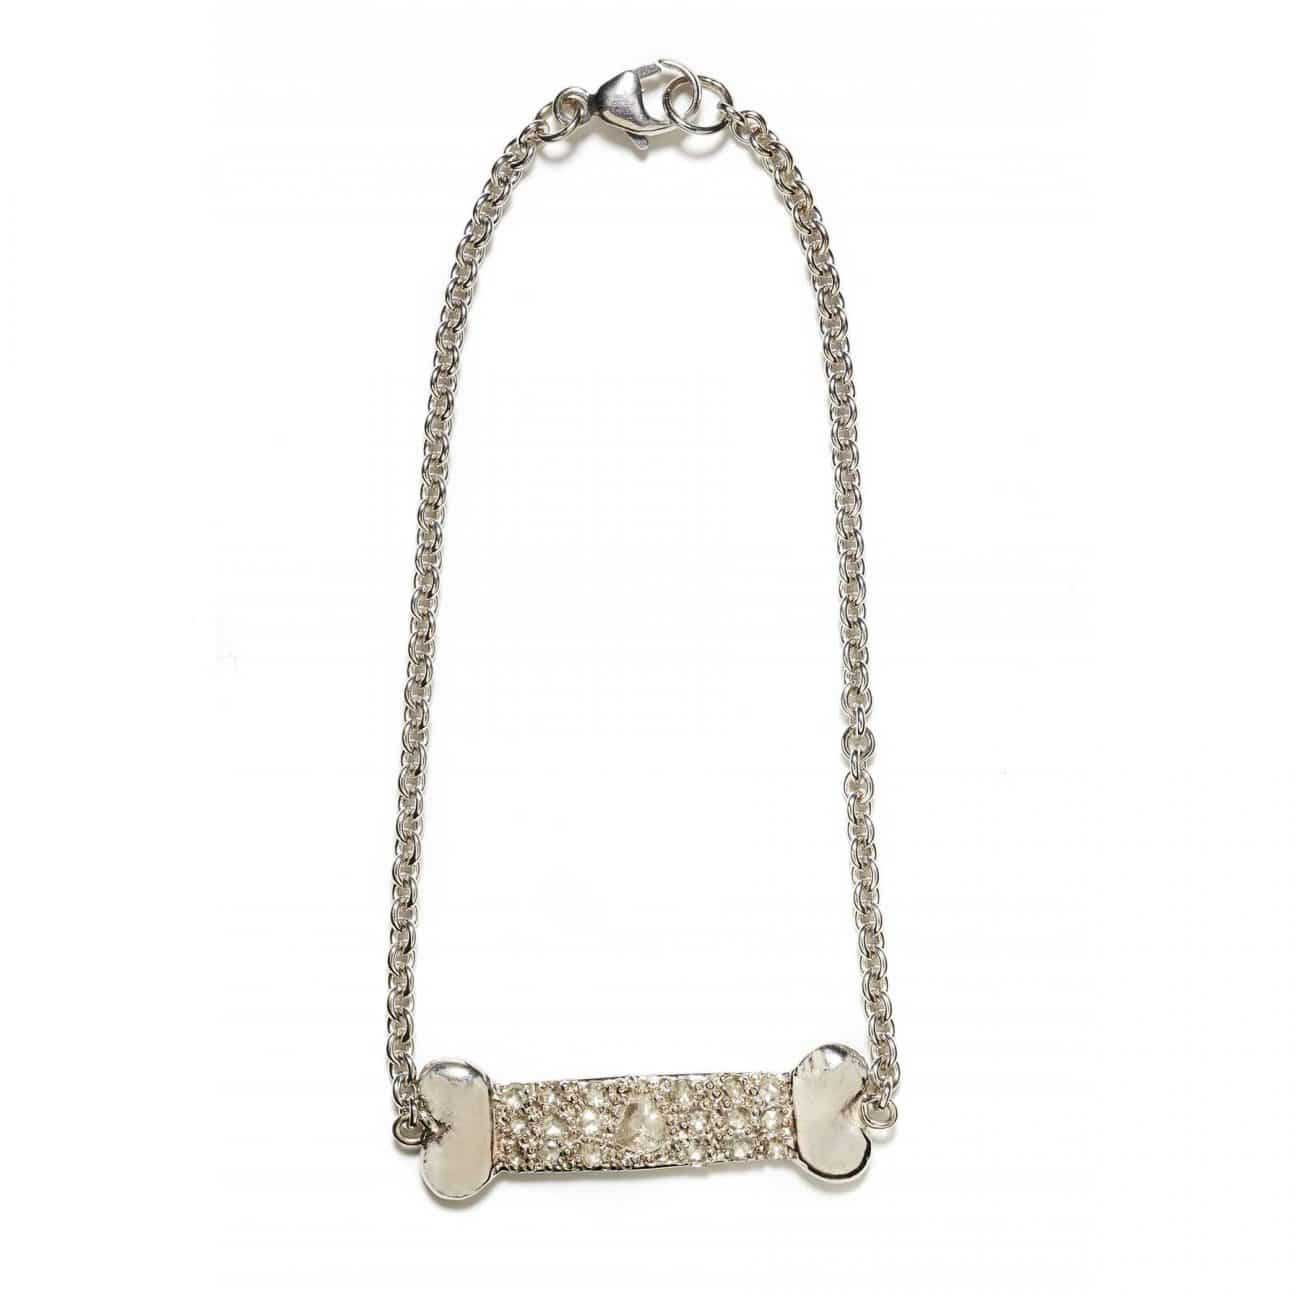 back of dog bone id bracelet in white gold with diamond